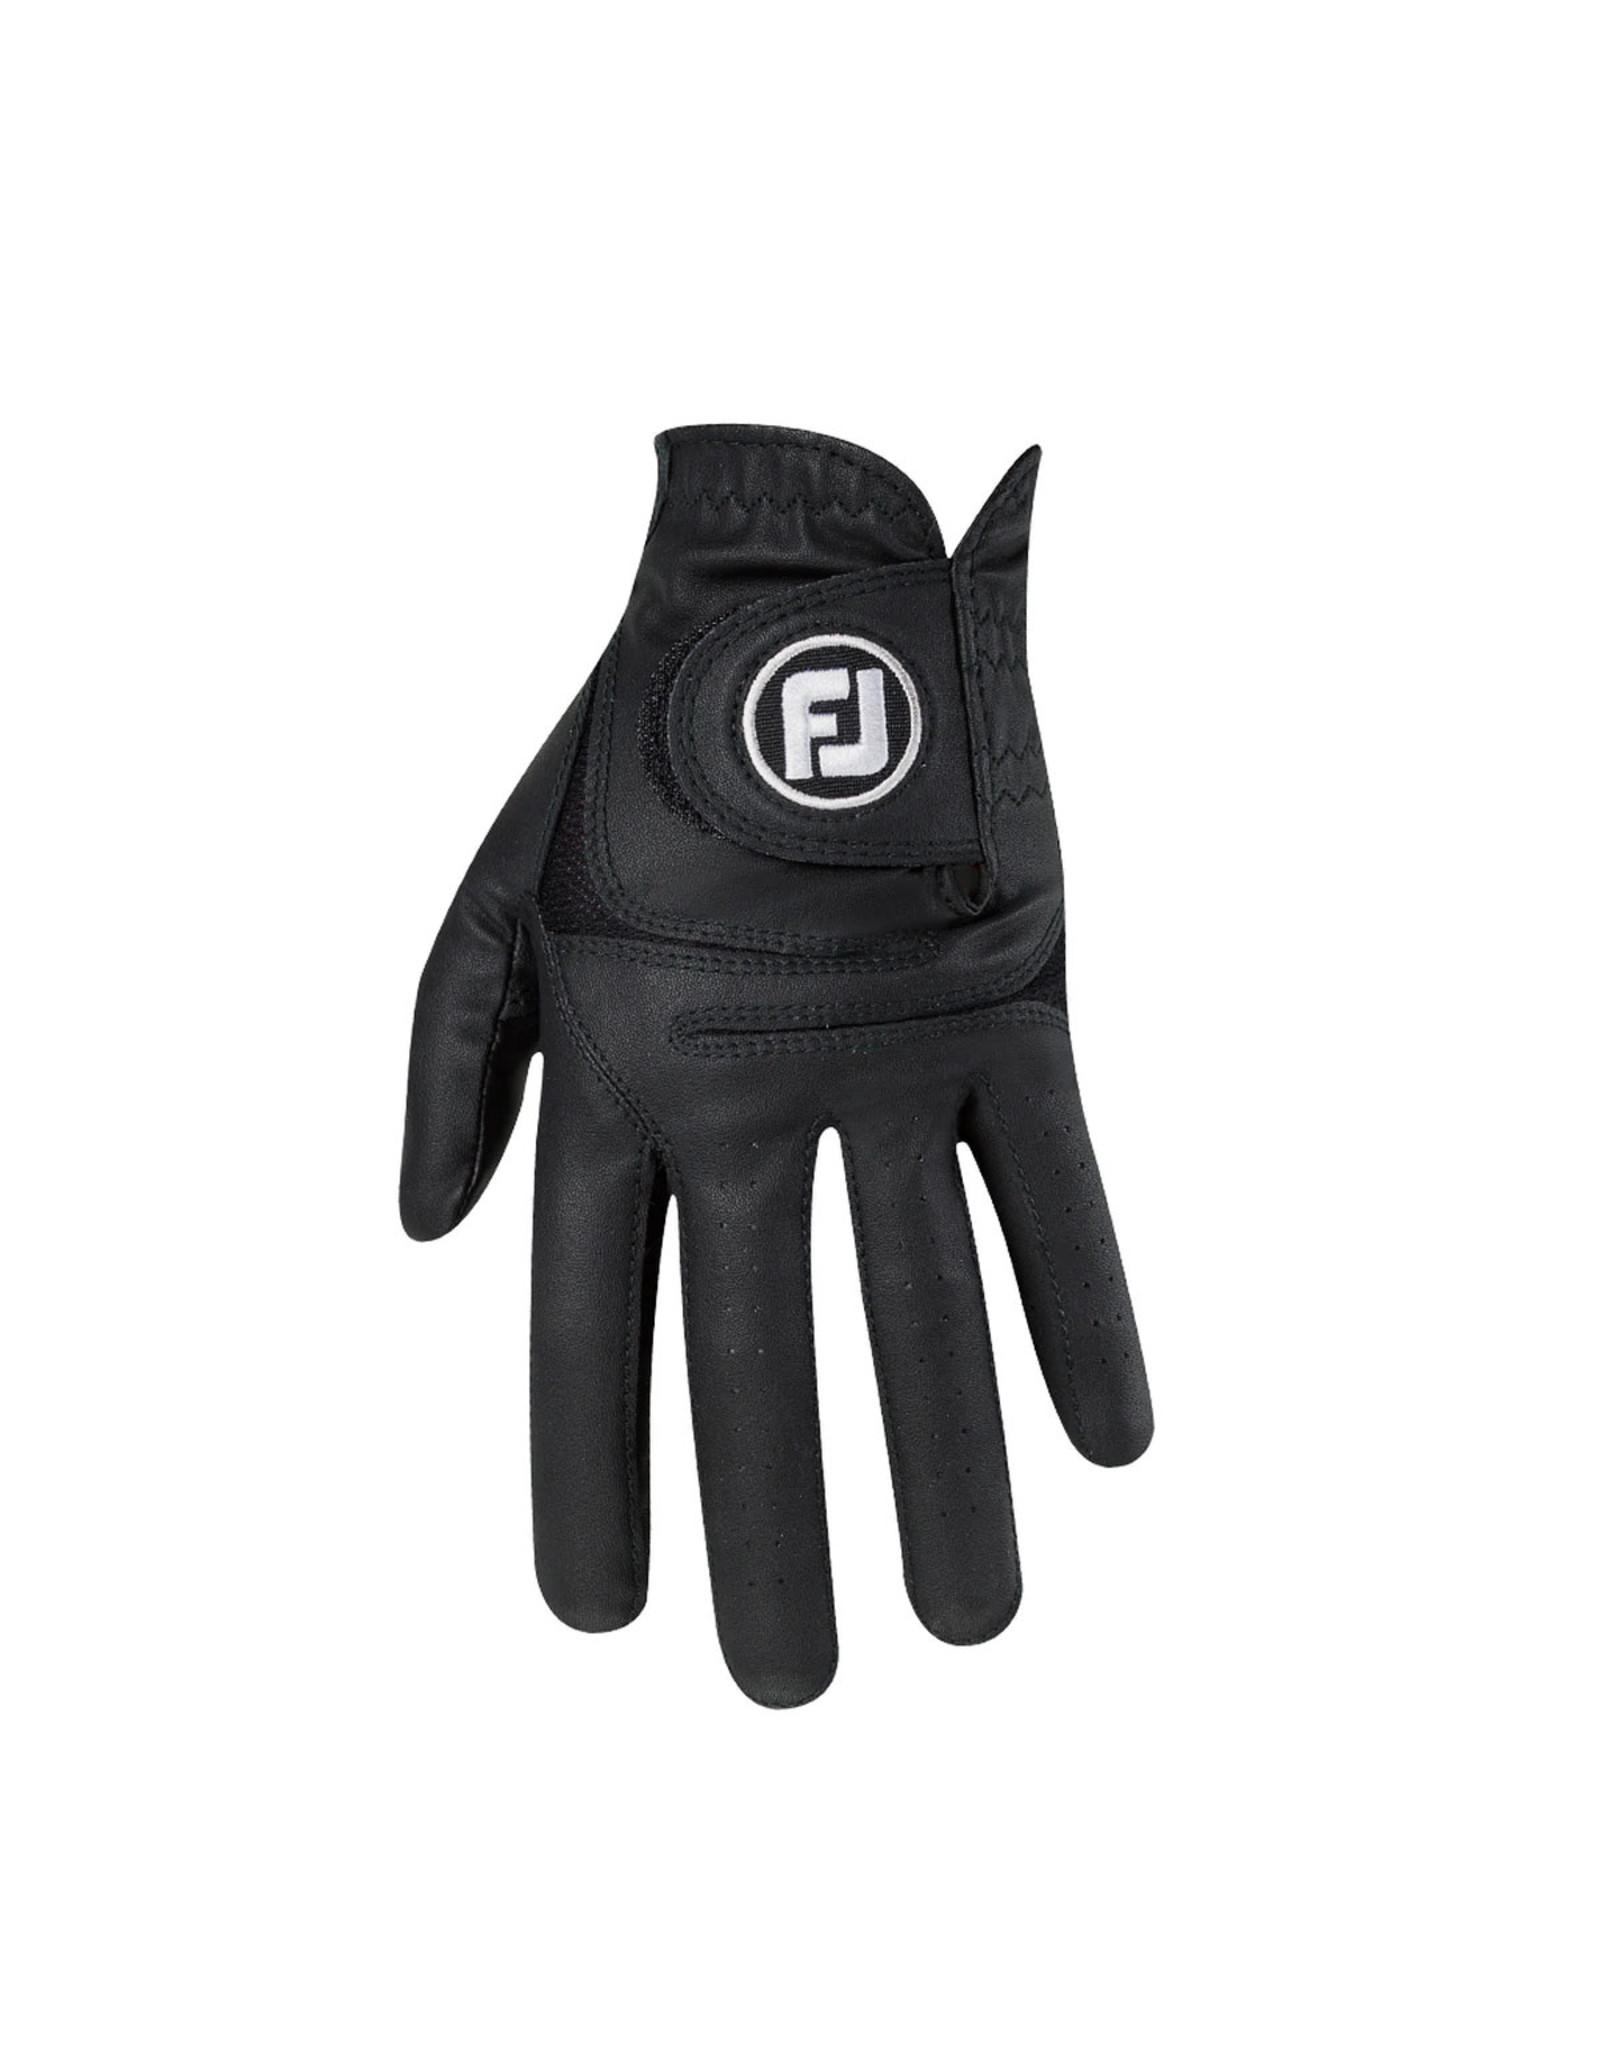 FootJoy FootJoy Men's WeatherSof Glove Black